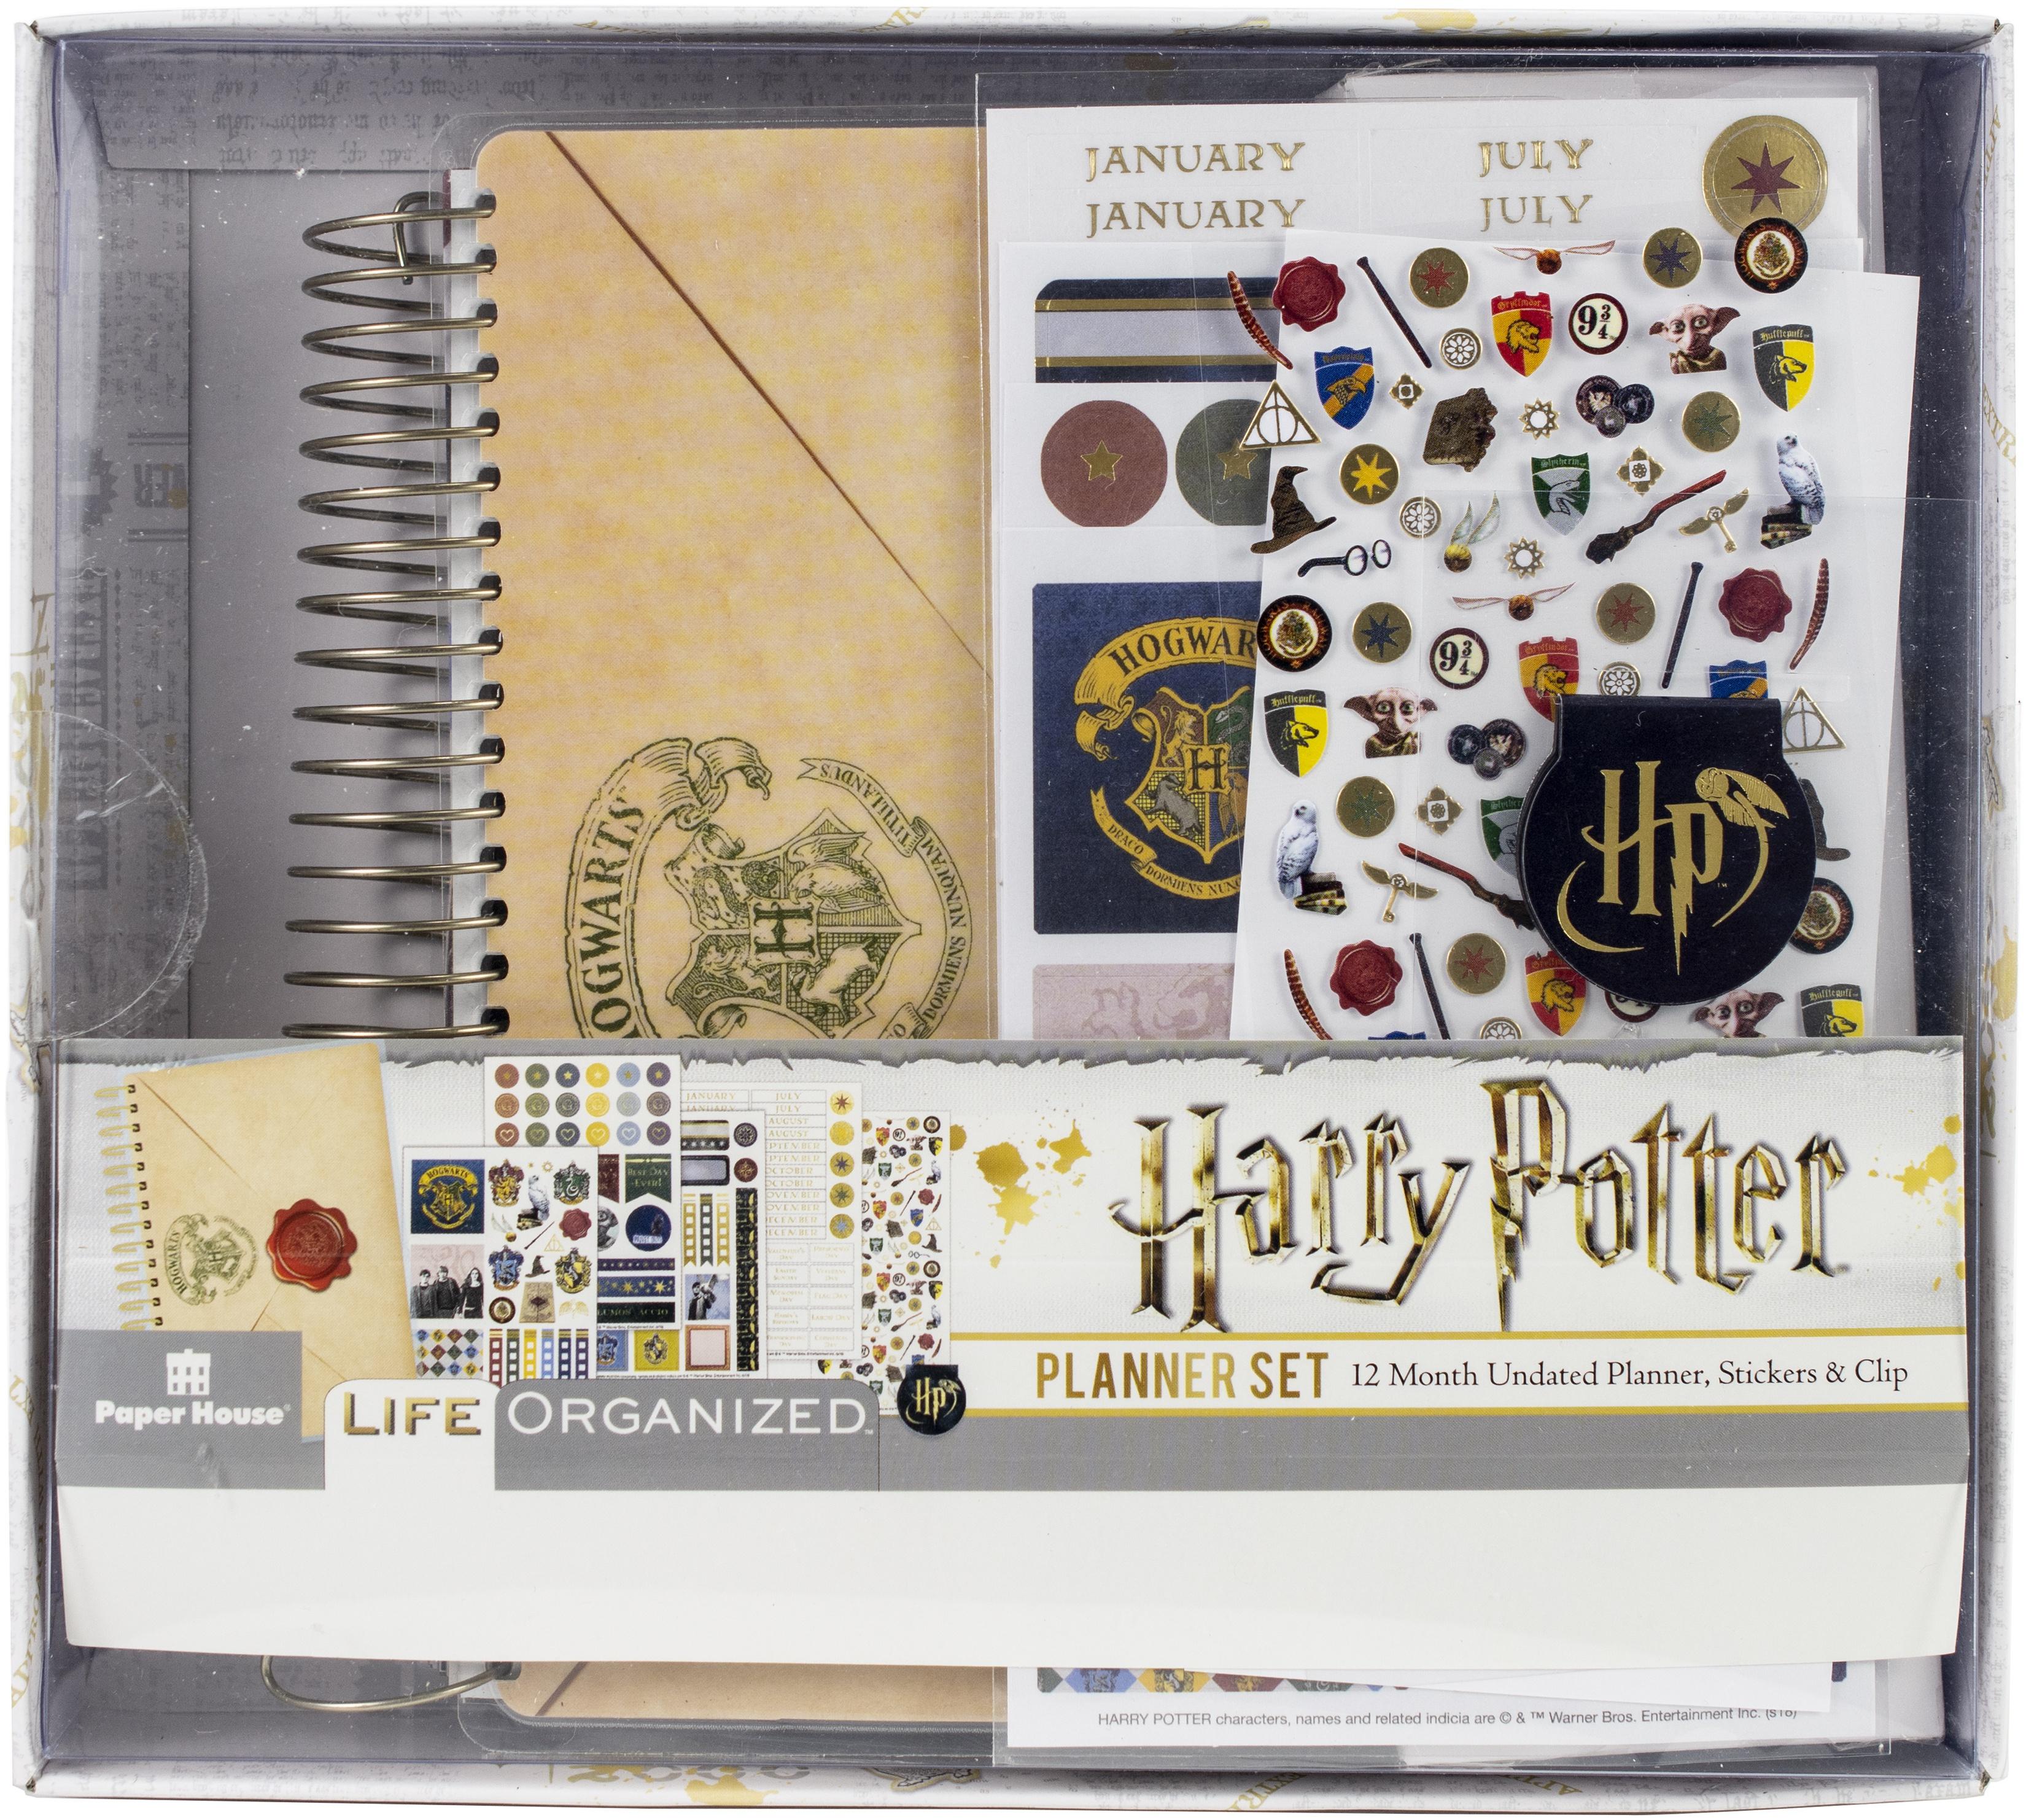 Harry Potter 12-Month Mini Planner Set